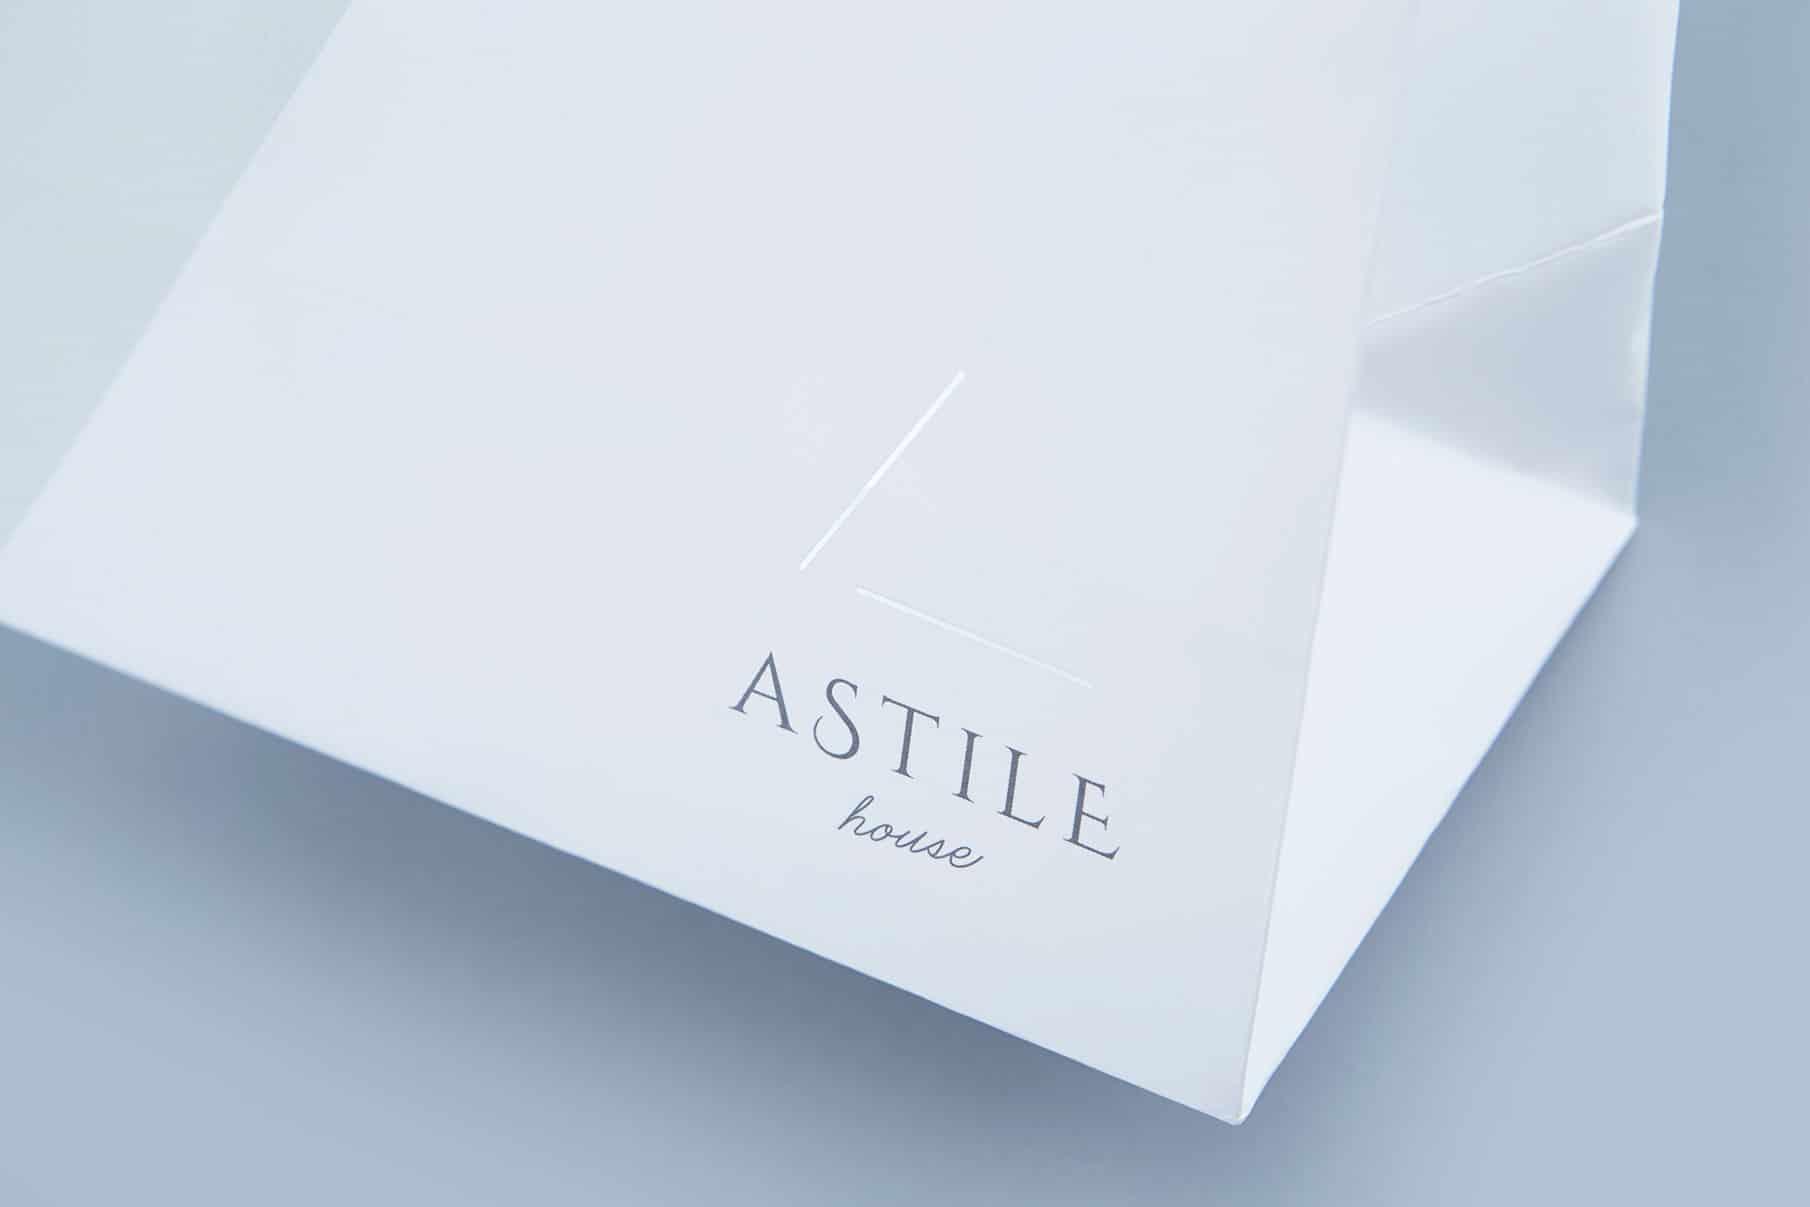 ASTILE house - Shop Tools 6